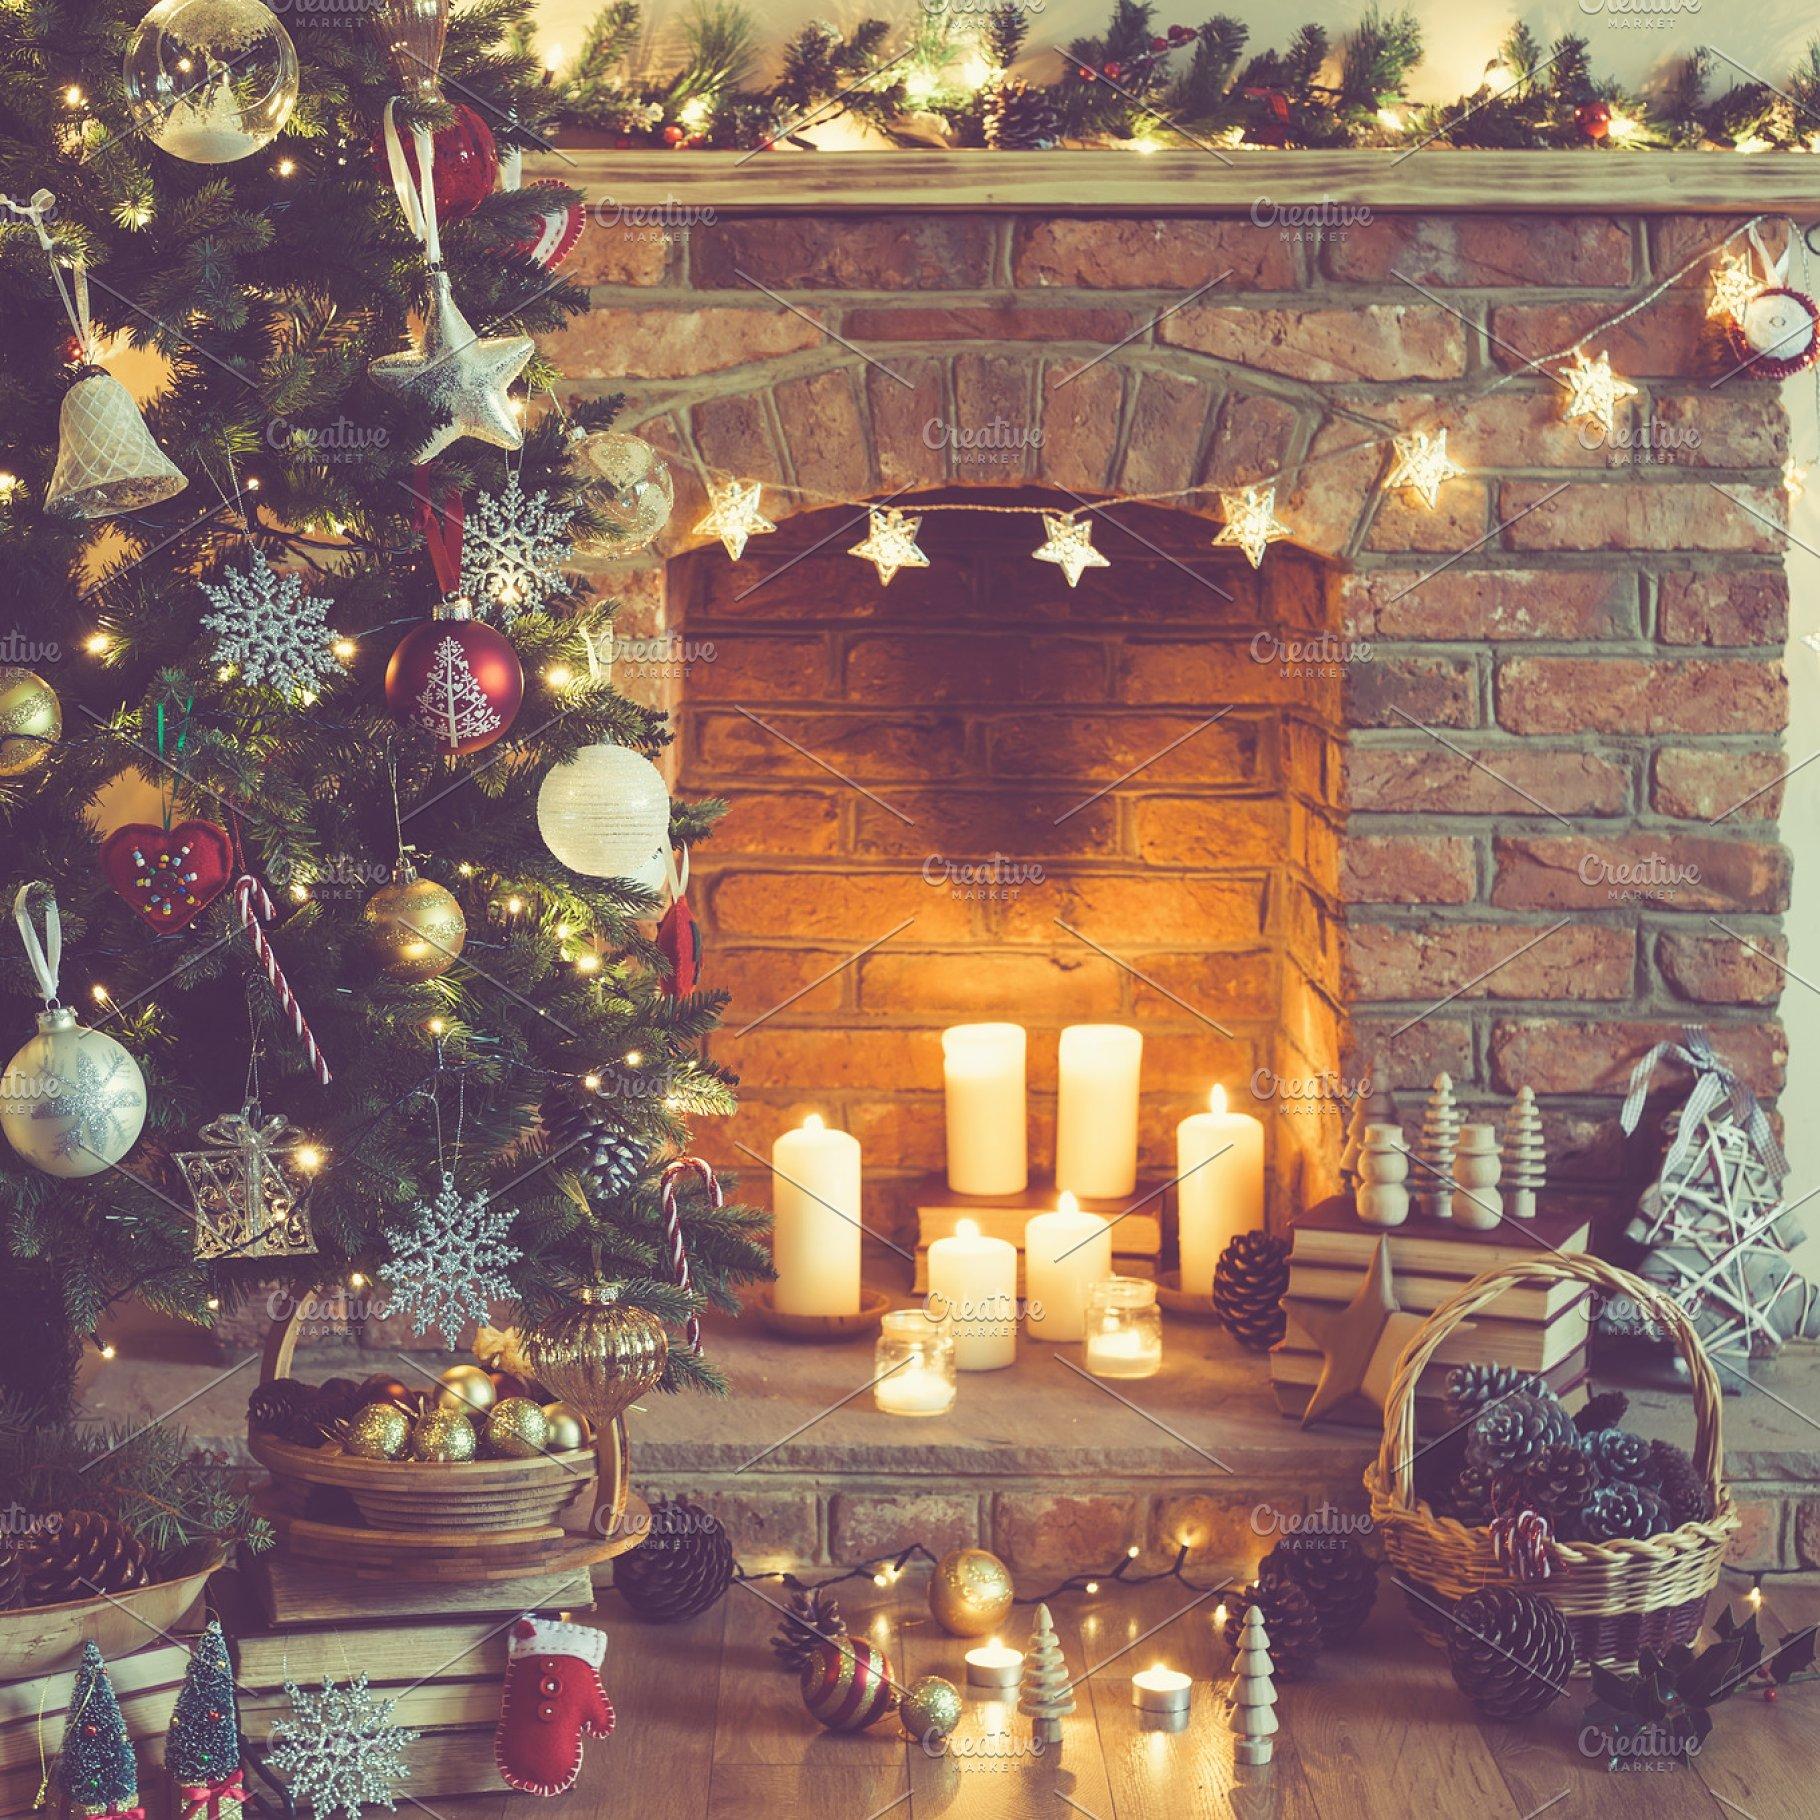 Fireplace Christmas.Christmas Setting Fireplace Candles